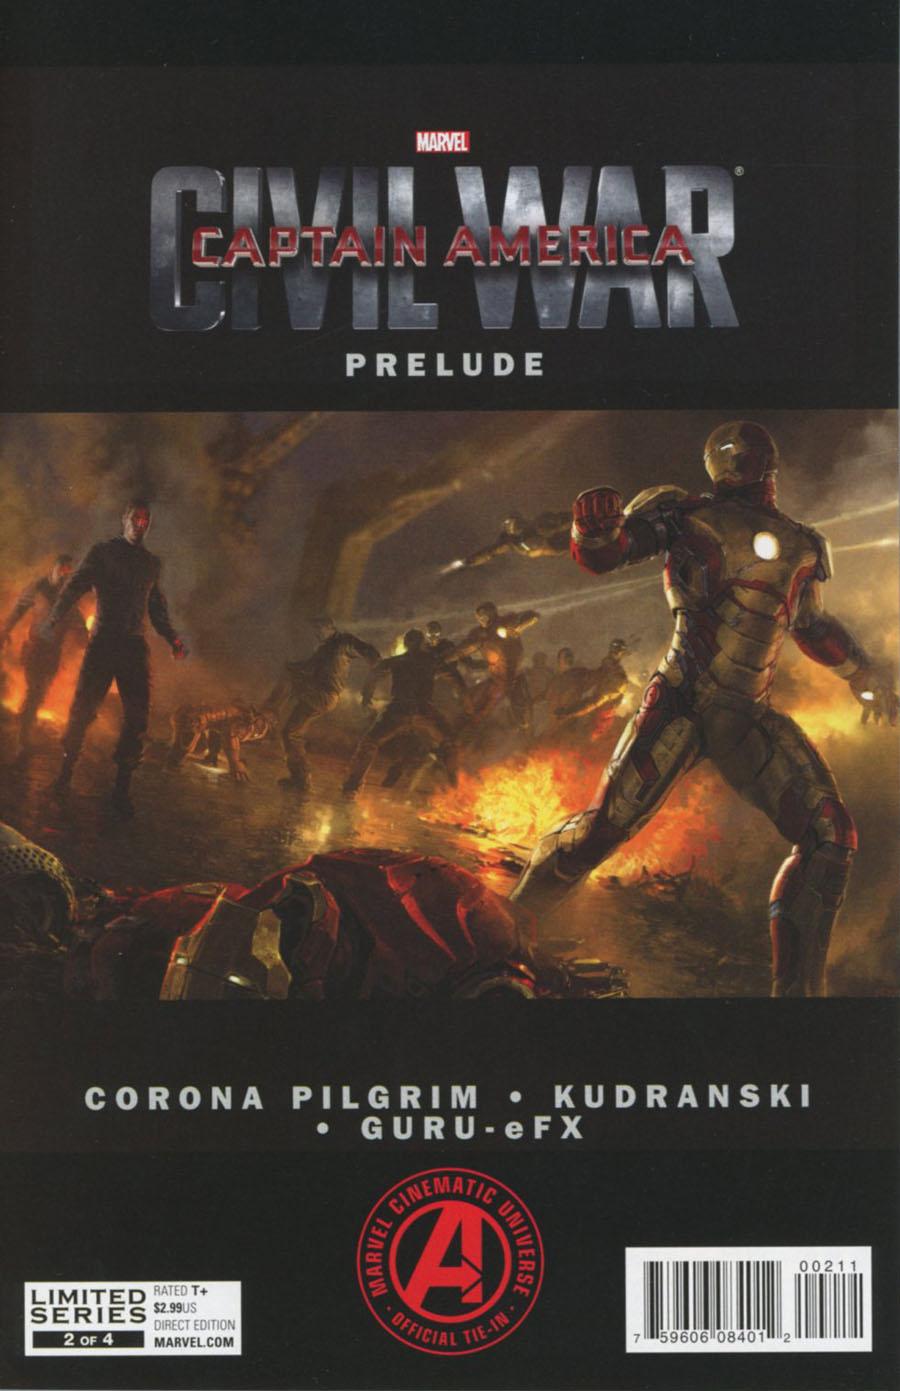 Marvels Captain America Civil War Prelude #2